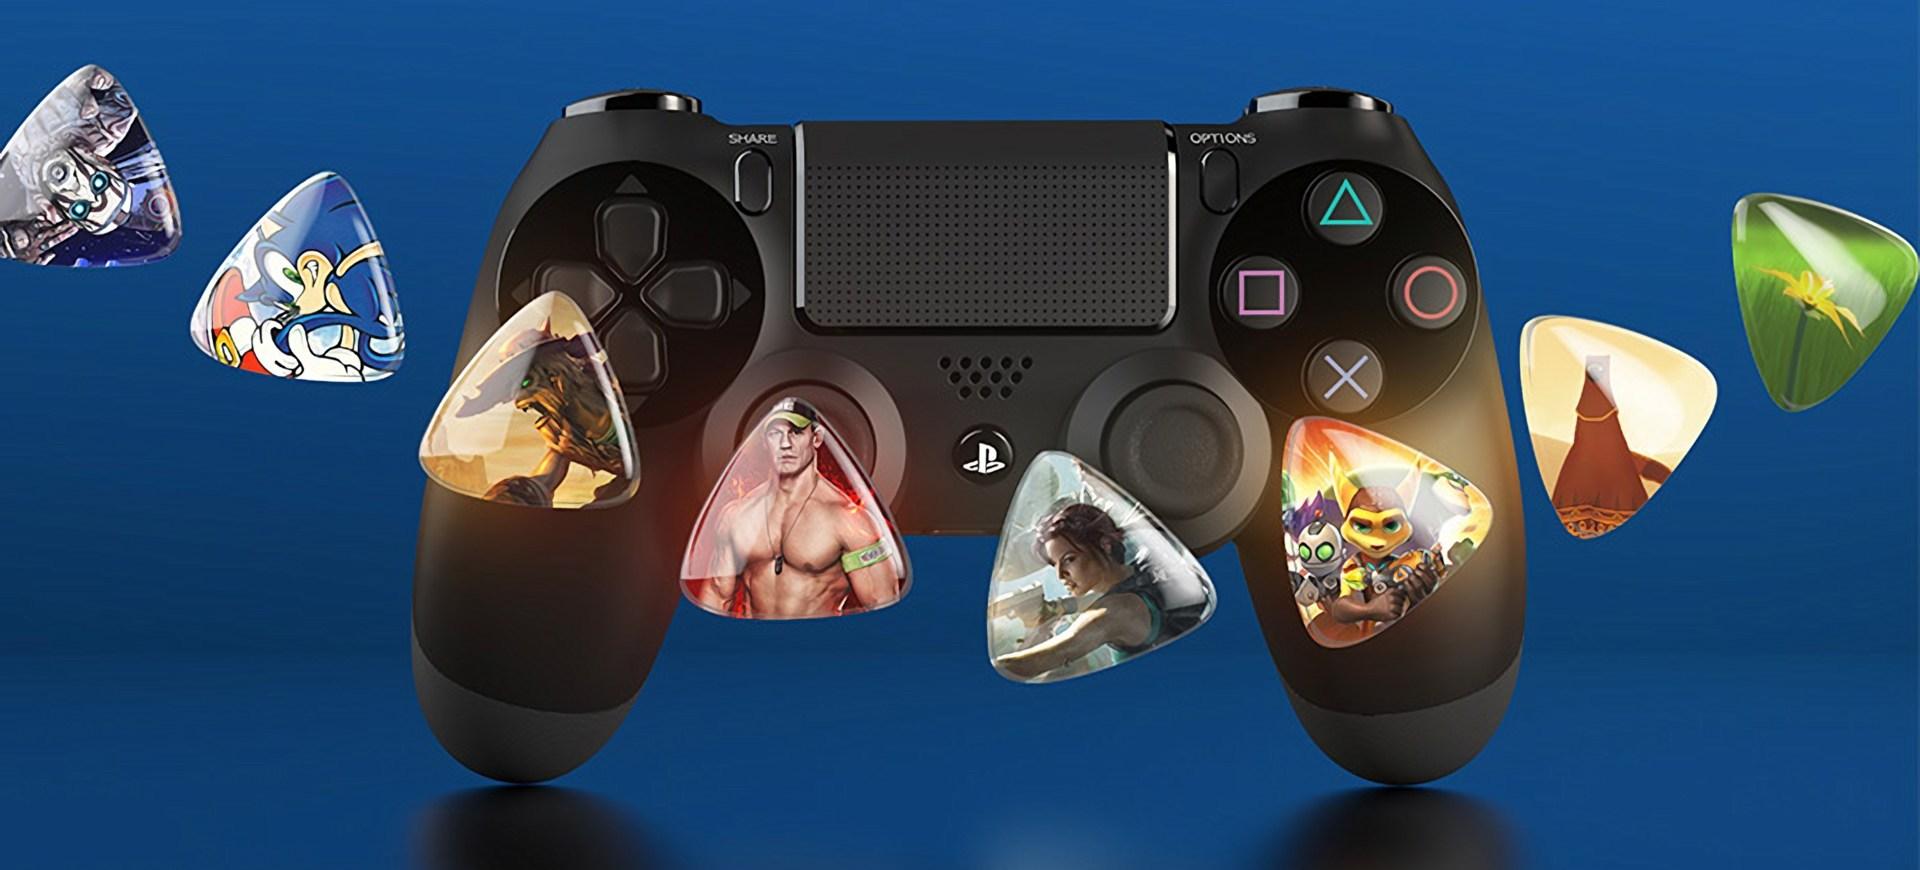 PlayStation Now – Thỏa hiệp để chiến thắng